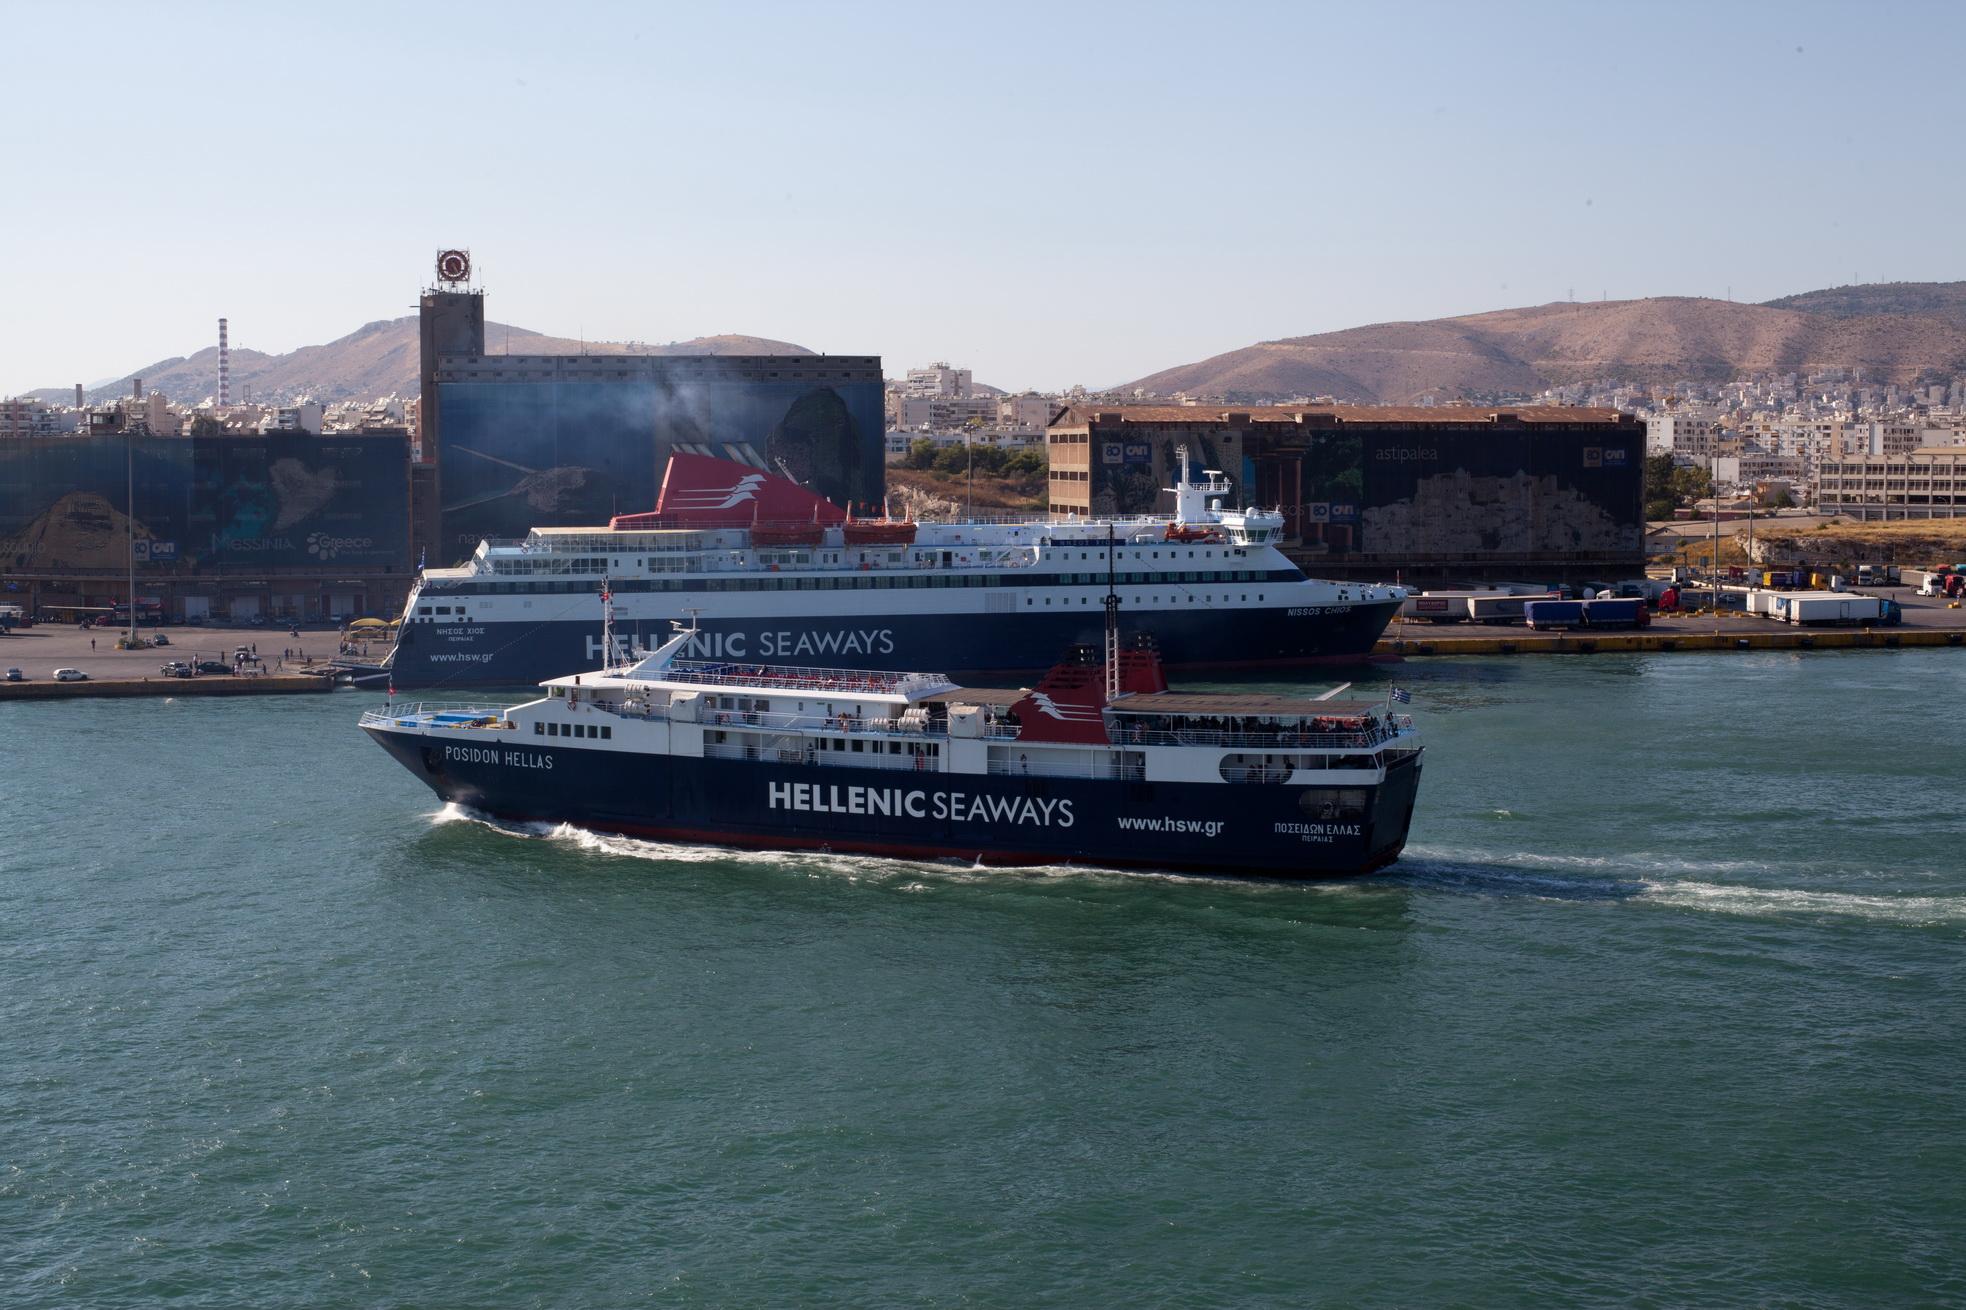 MS Posidon Hellas IMO 8966963 Hellenic Seaways Piraeus Port of Athens Greece 05